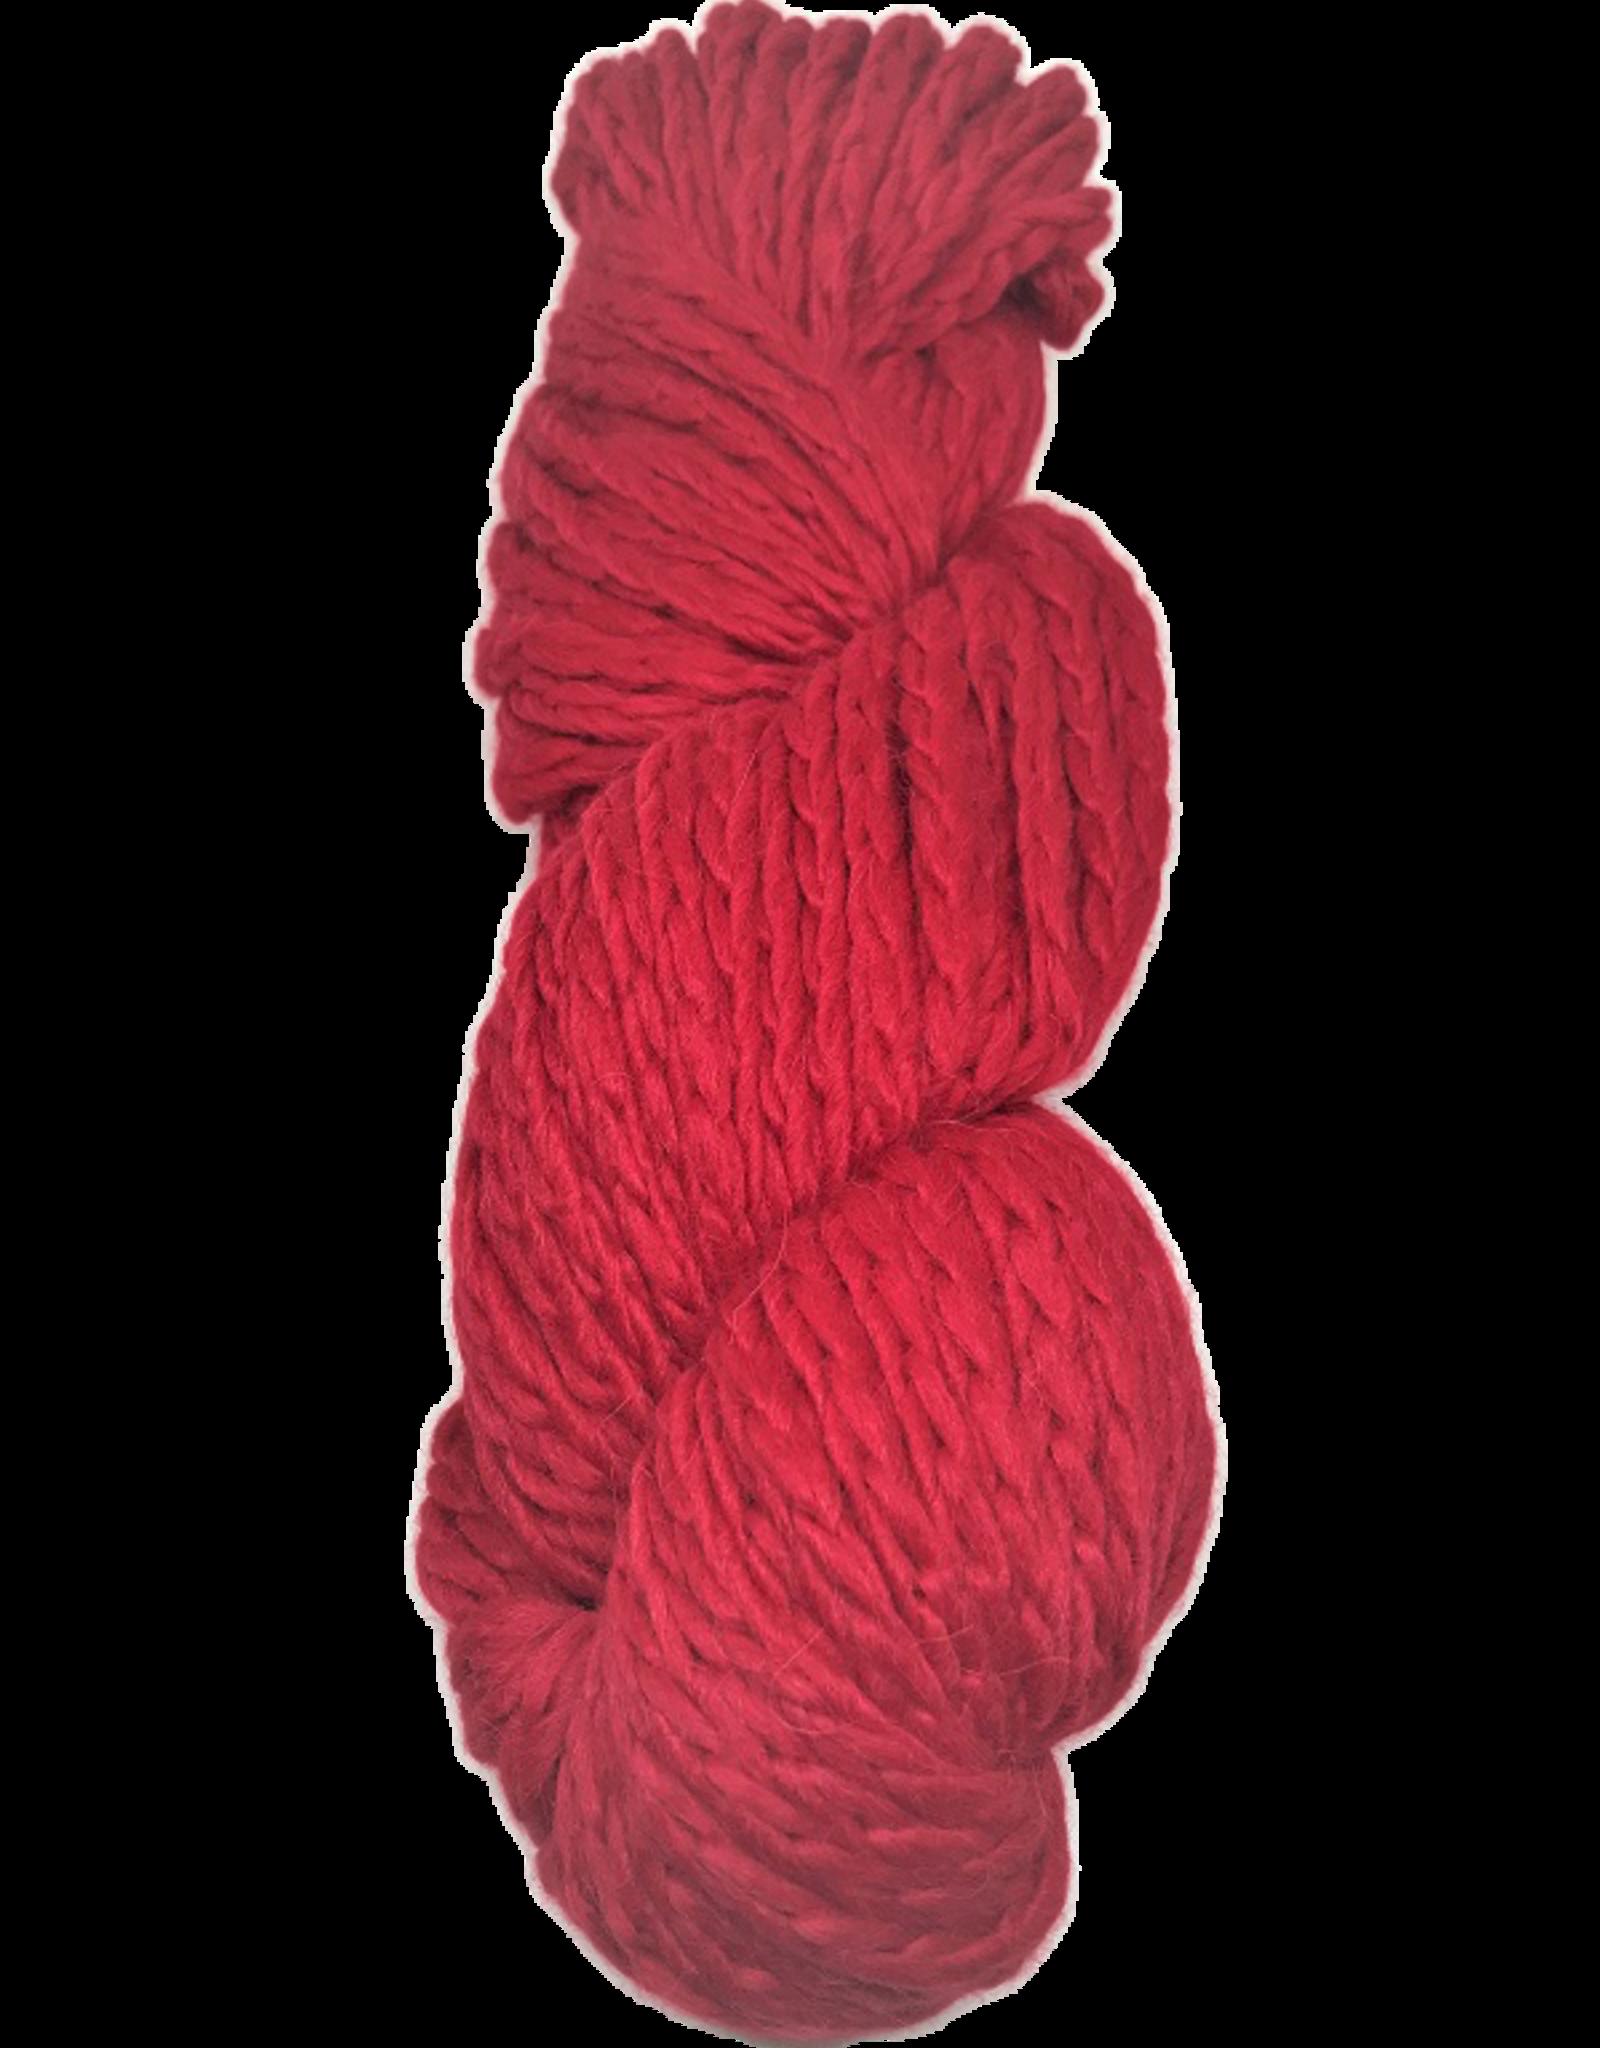 Illimani Cadena Bulky Red